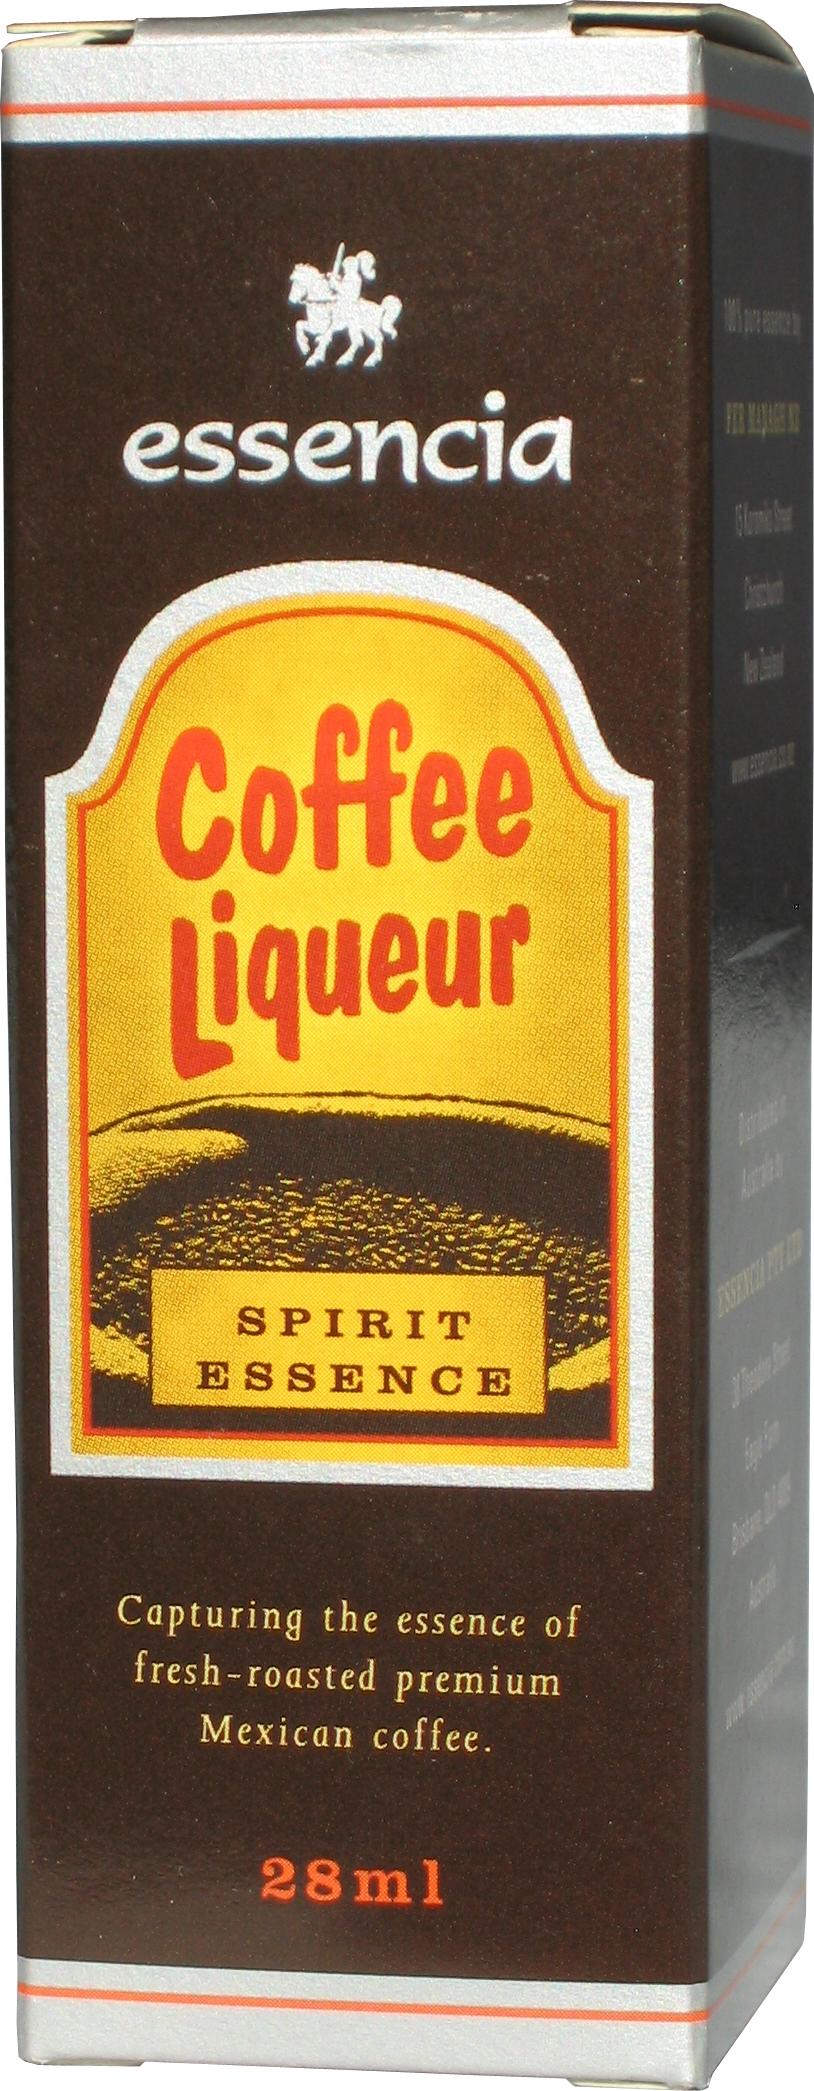 Essencia Coffee Liqueur